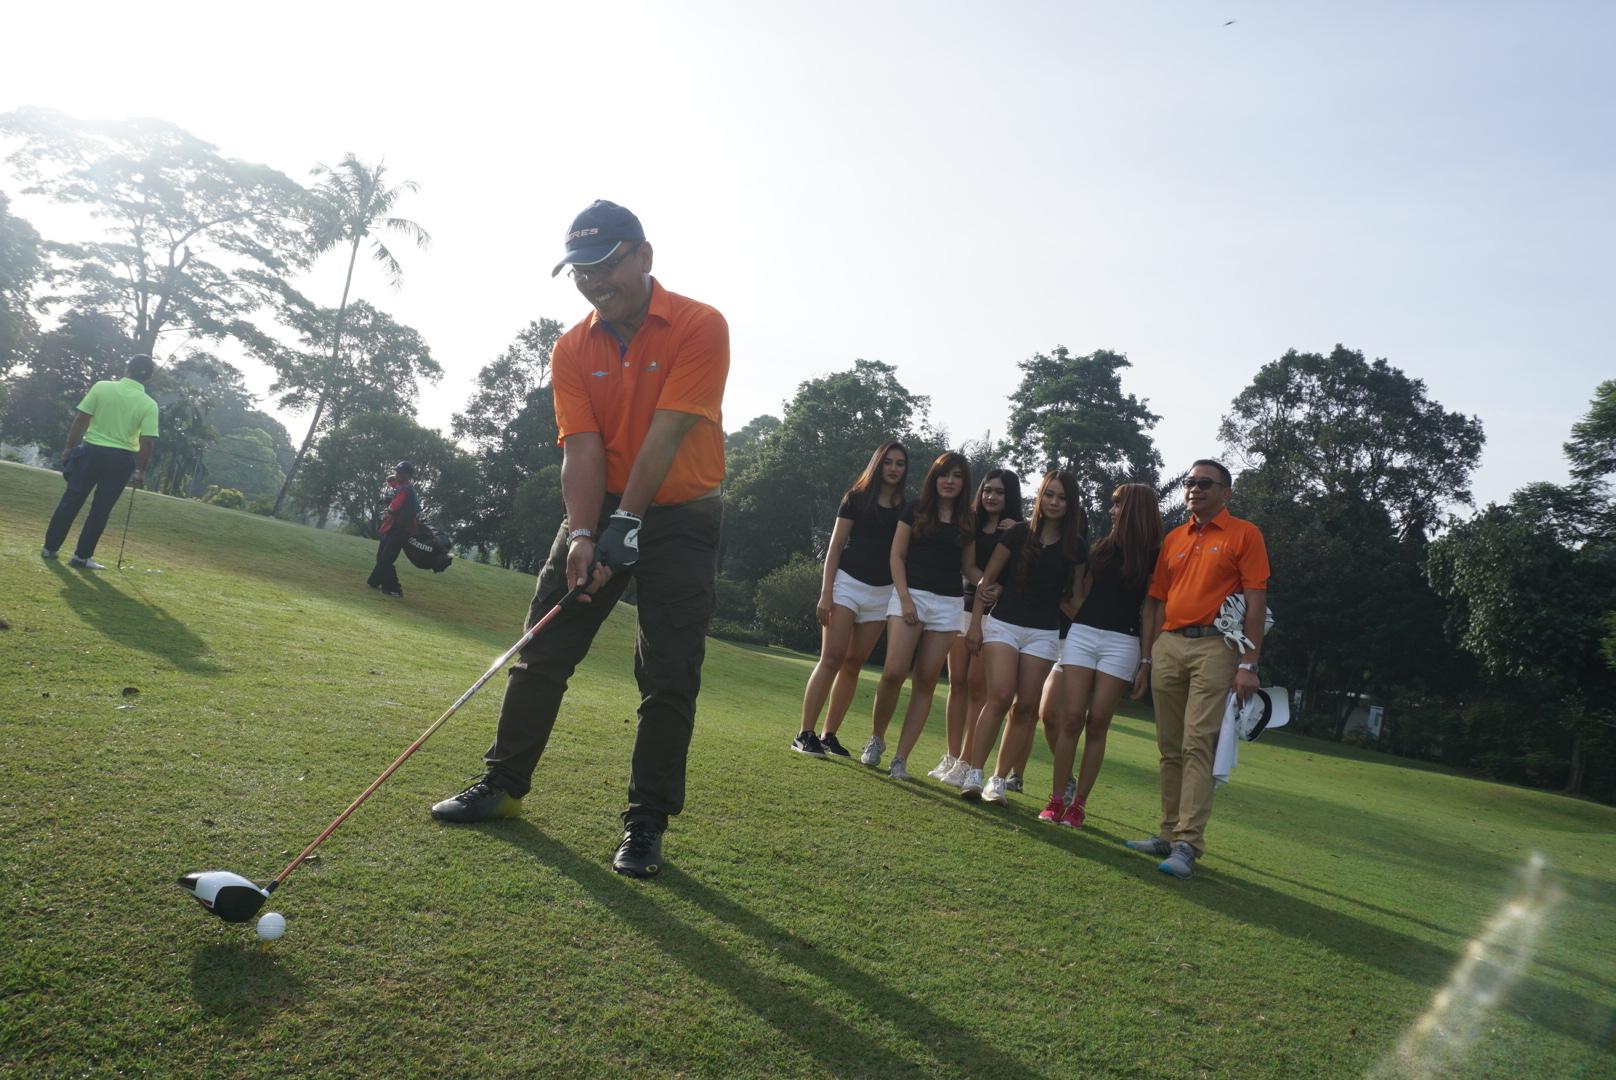 Turnamen Golf Eagle52 Resmi Dibuka